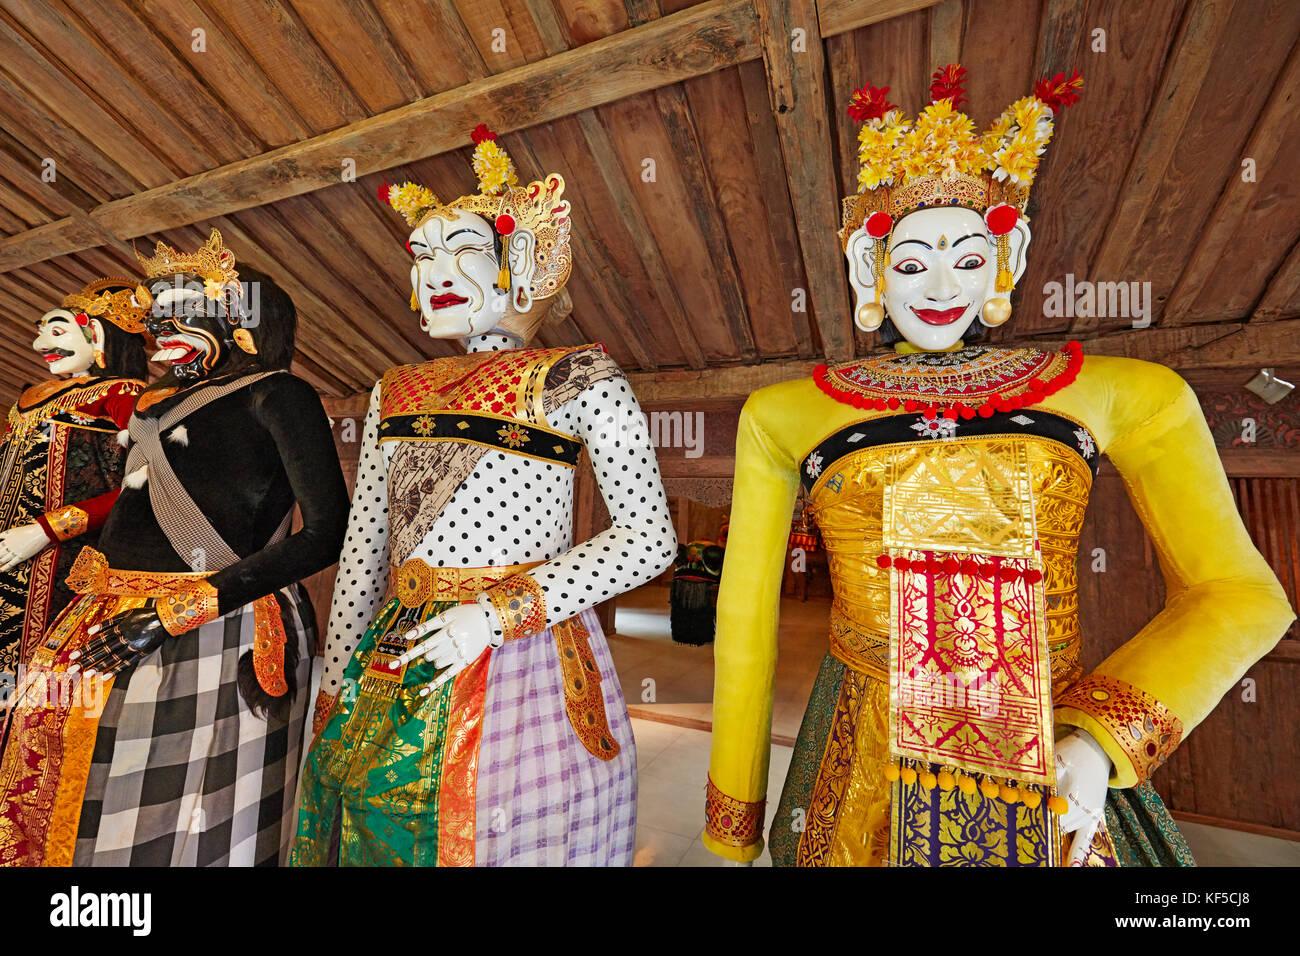 Barong landung, marionnettes traditionnelles balinaises. setia darma house de masques et de marionnettes, mas, Ubud, Photo Stock